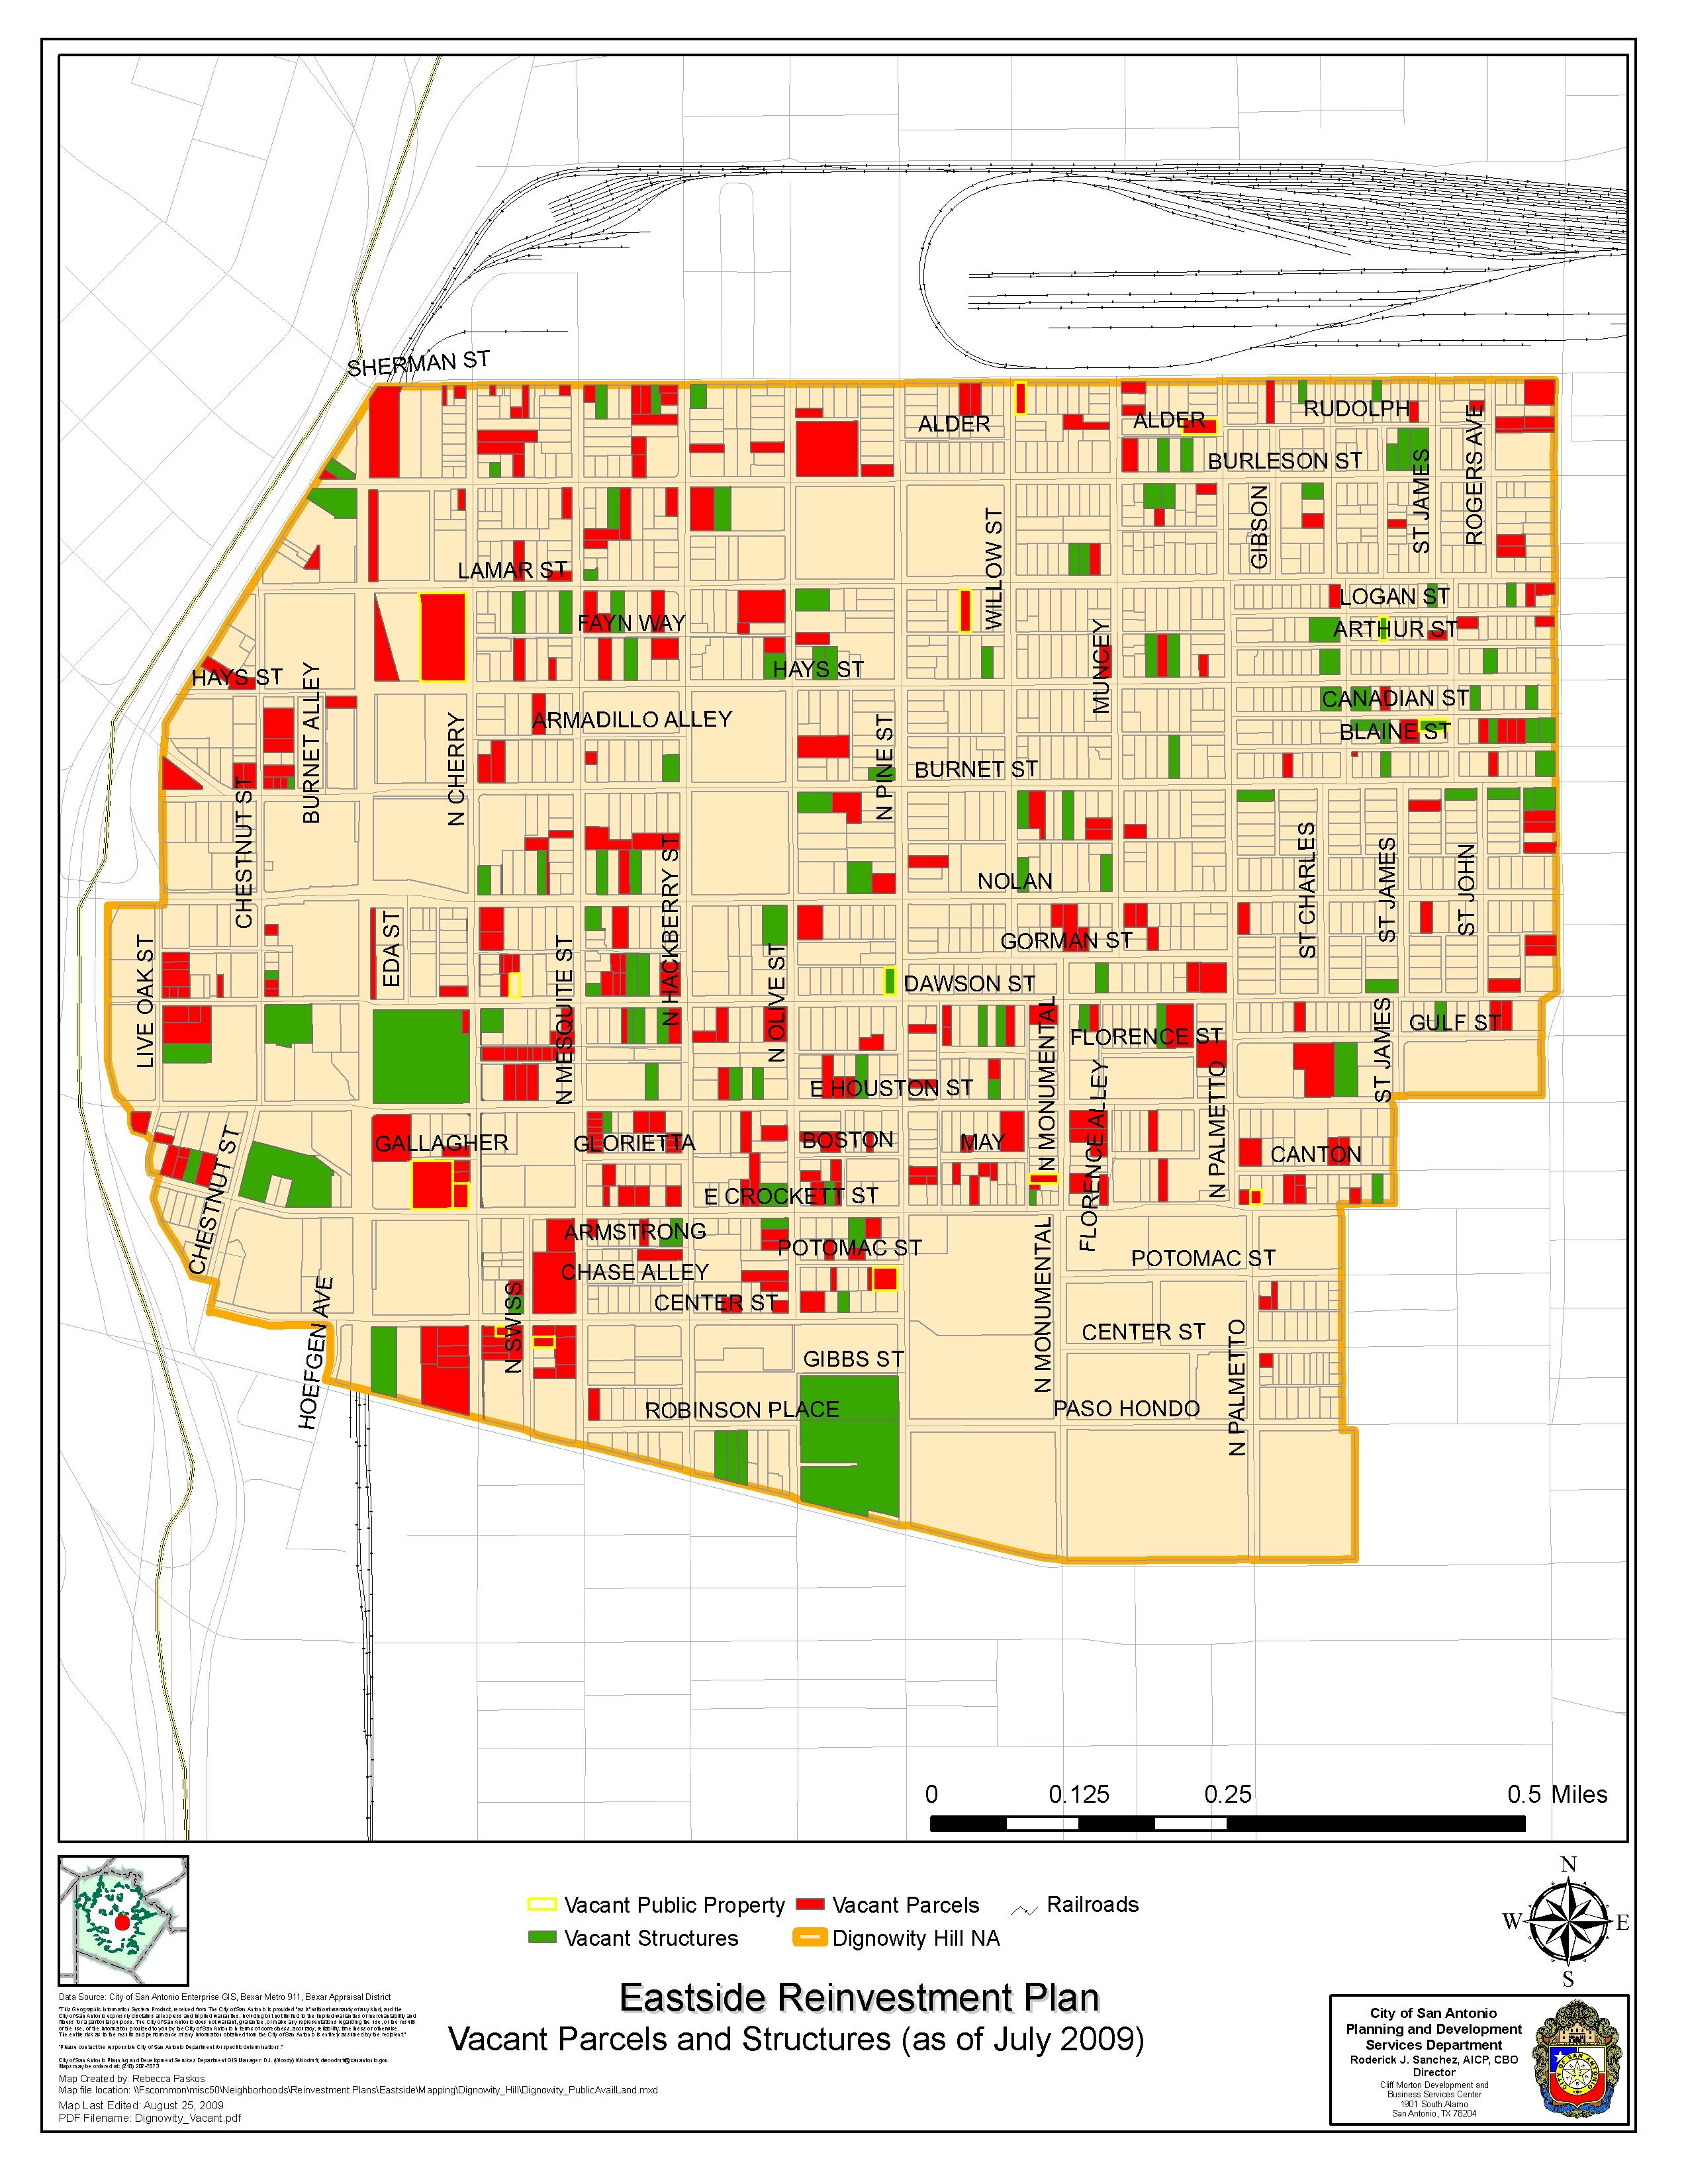 Eastside Reinvestment Area Maps 2009 Community